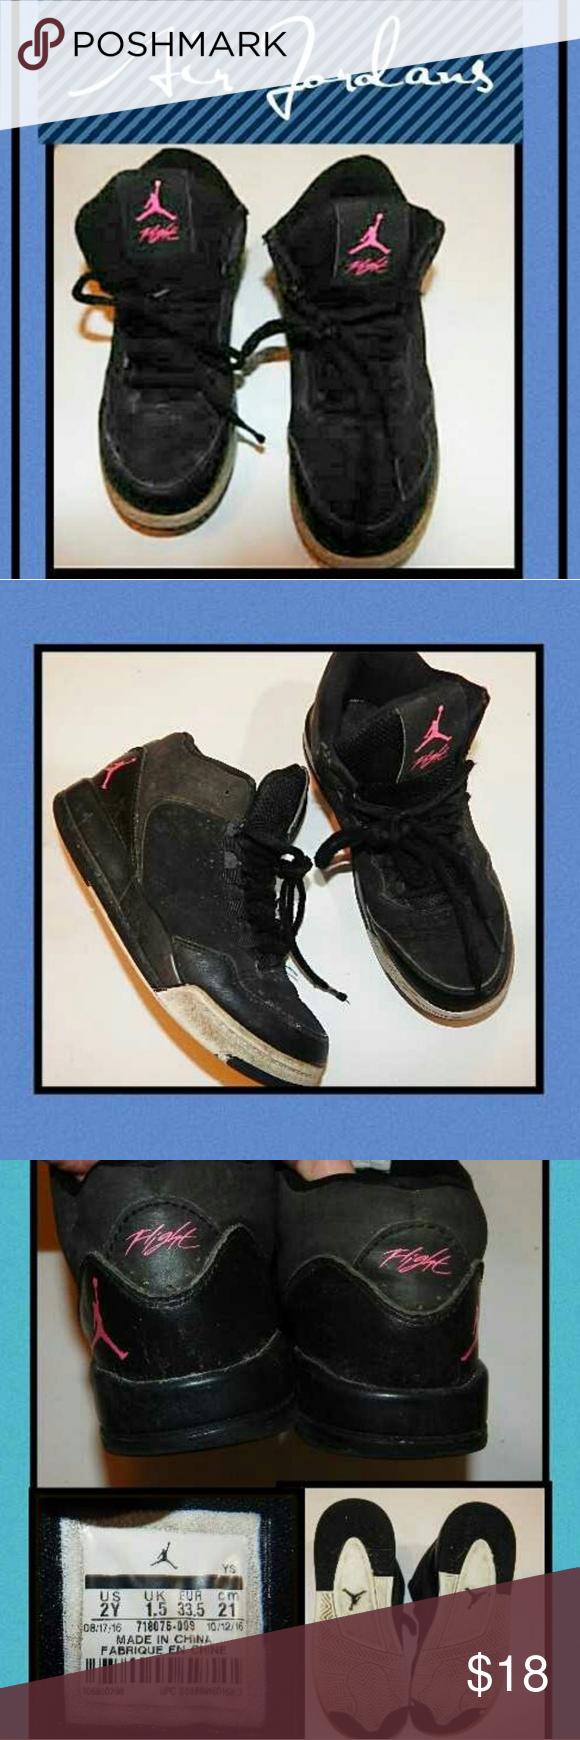 Air Jordan Flights Shoes!! Size 2 Youth